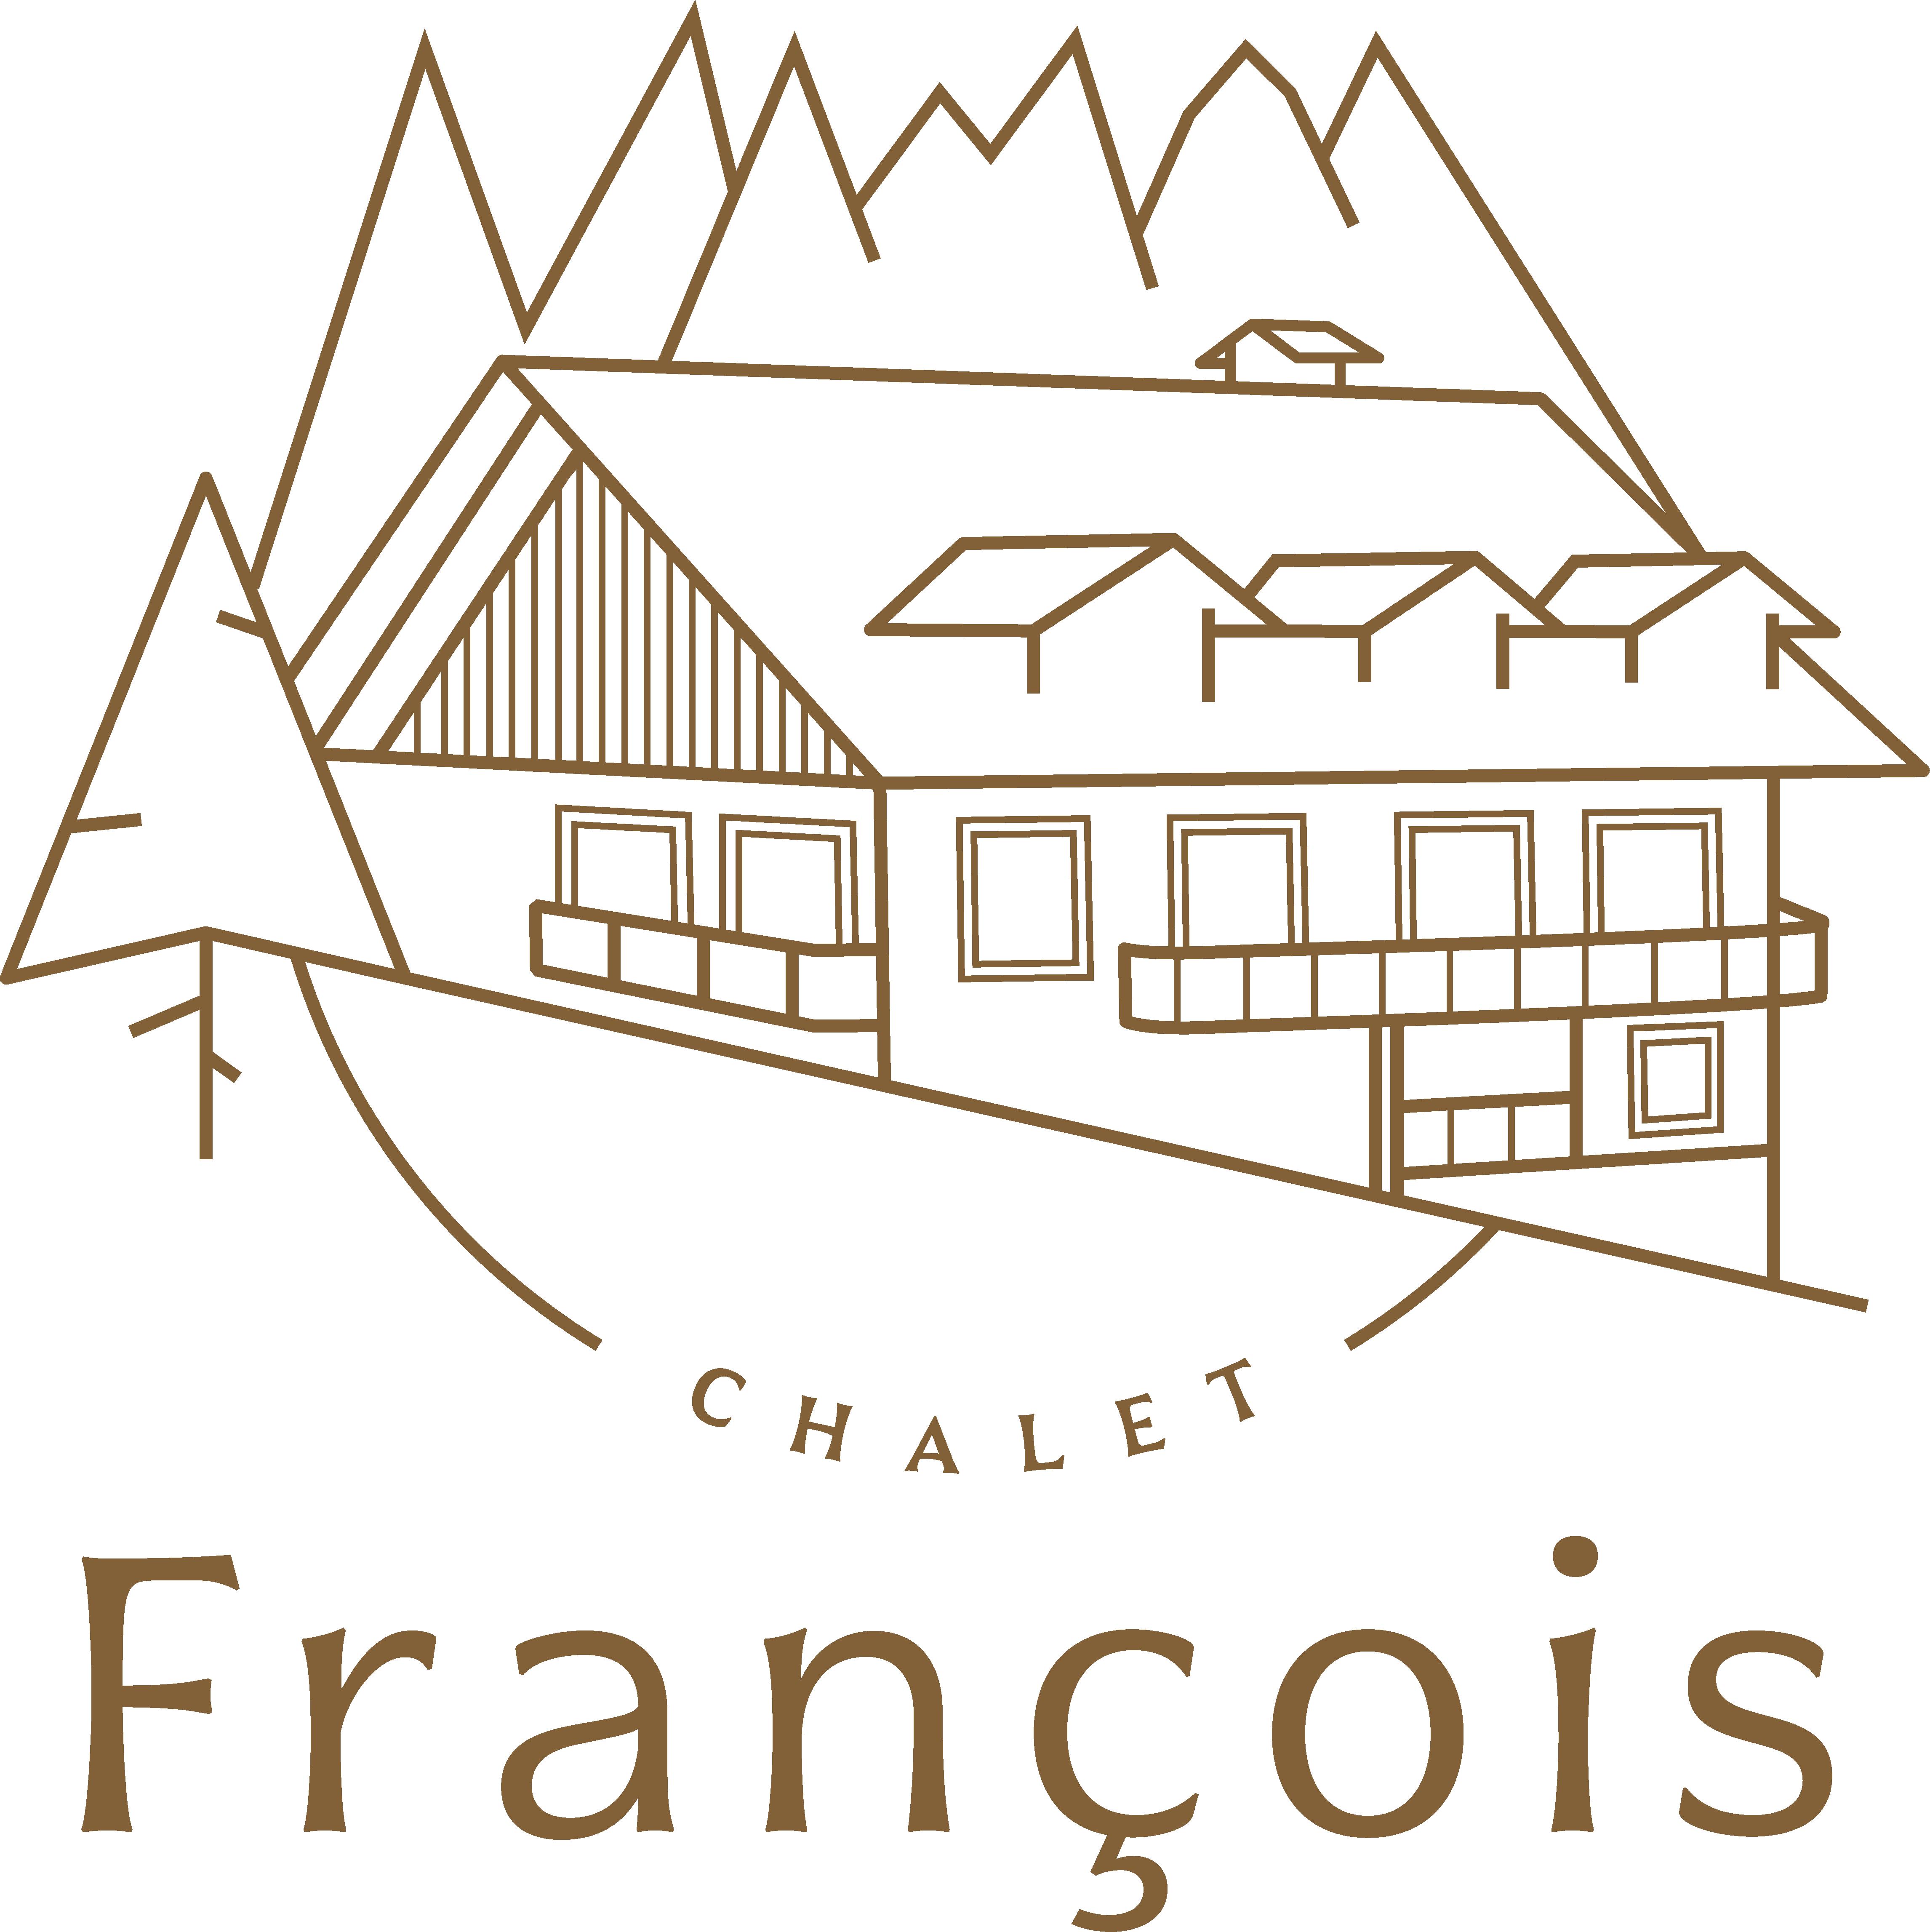 Chalet François